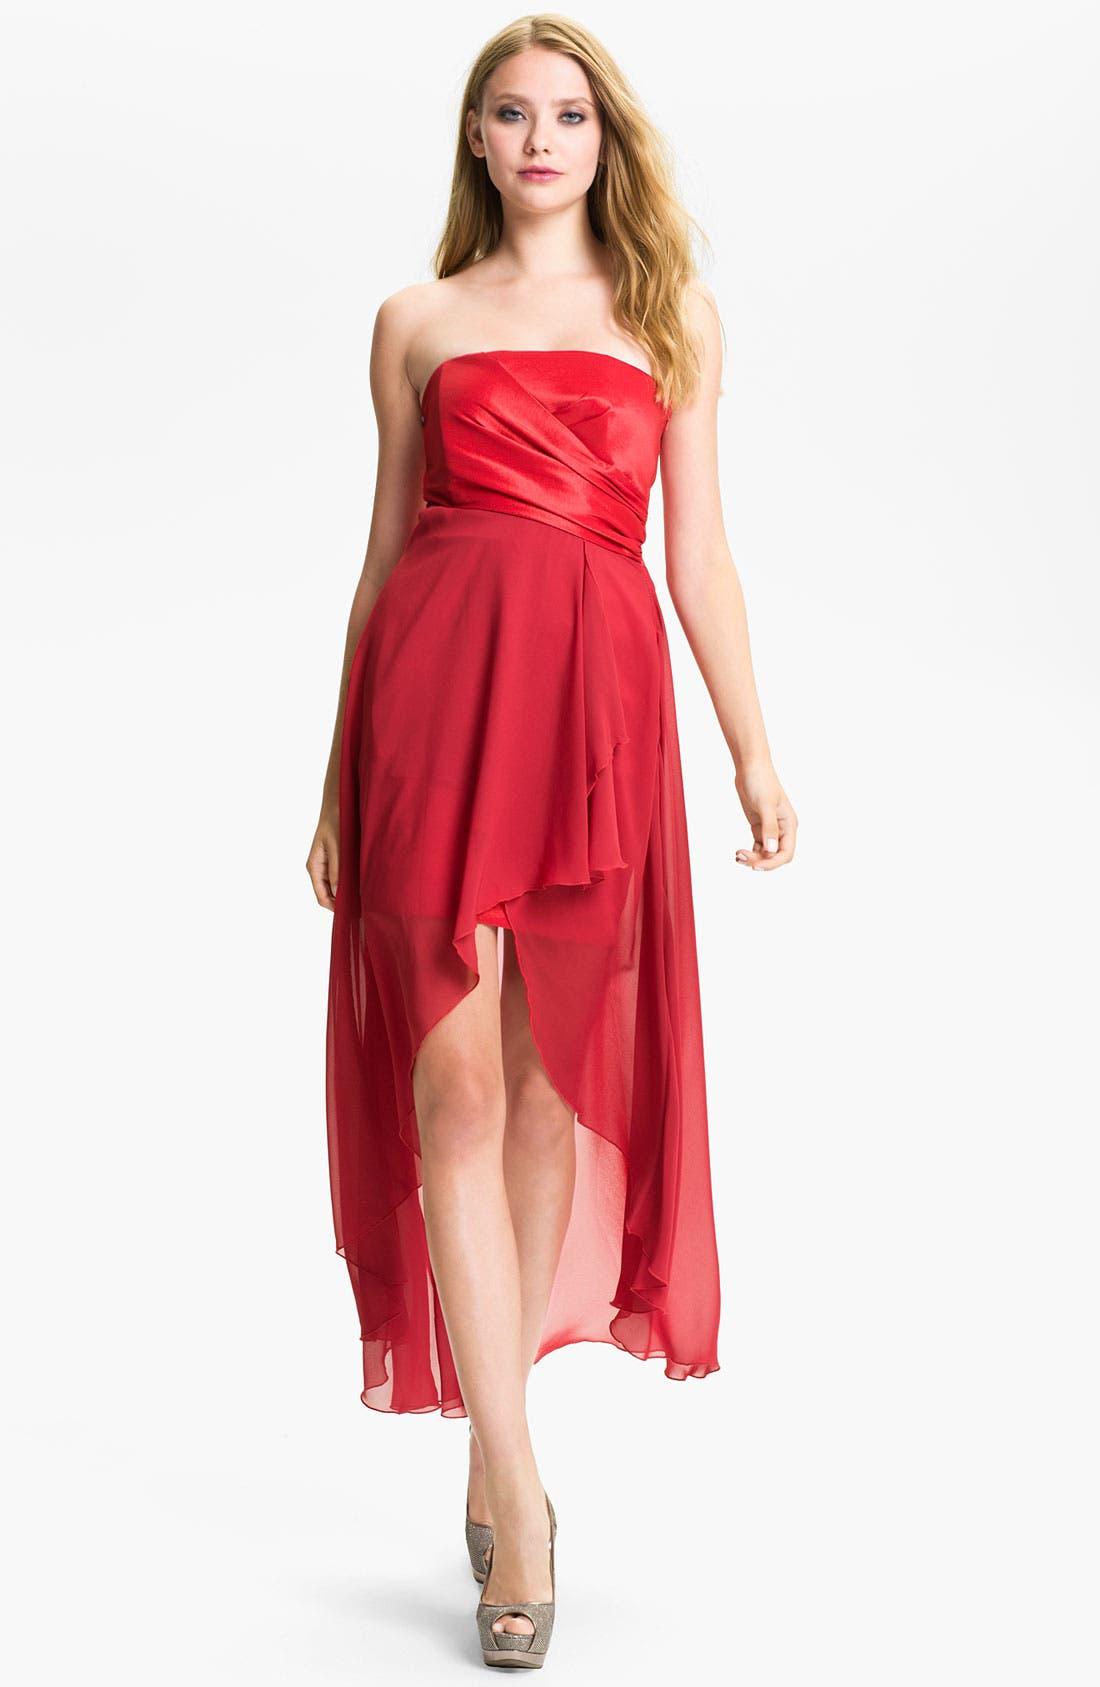 Main Image - Jessica McClintock Strapless Taffeta & Chiffon High/Low Dress